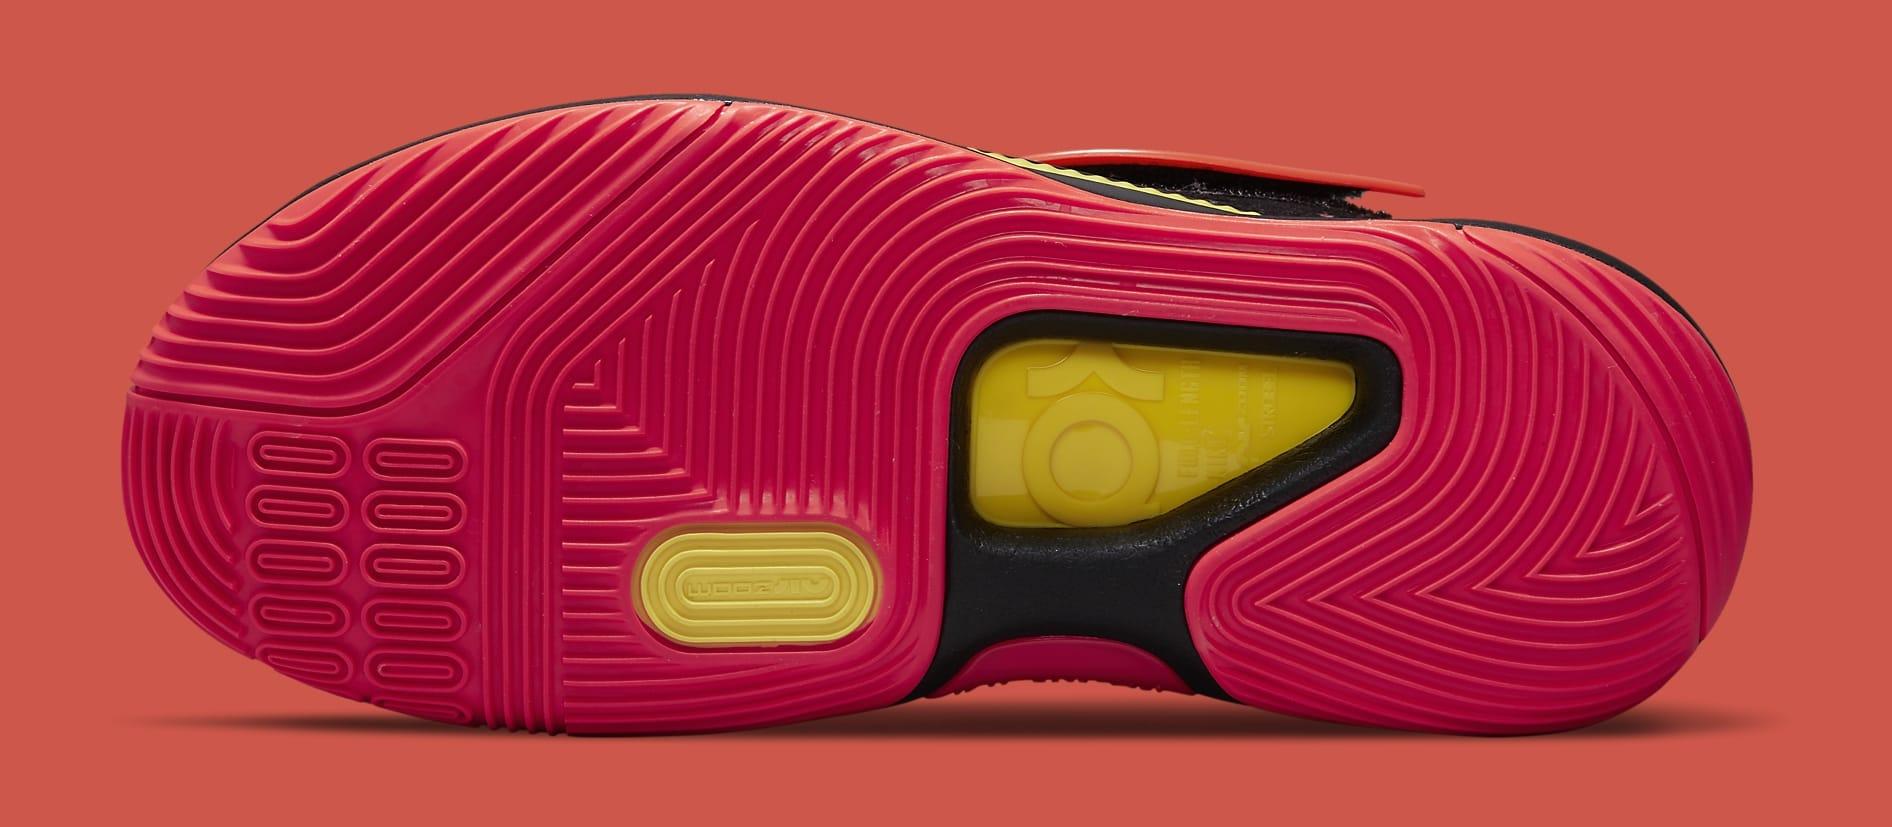 Nike KD 14 'Ky-D' CW3935-002 Outsole